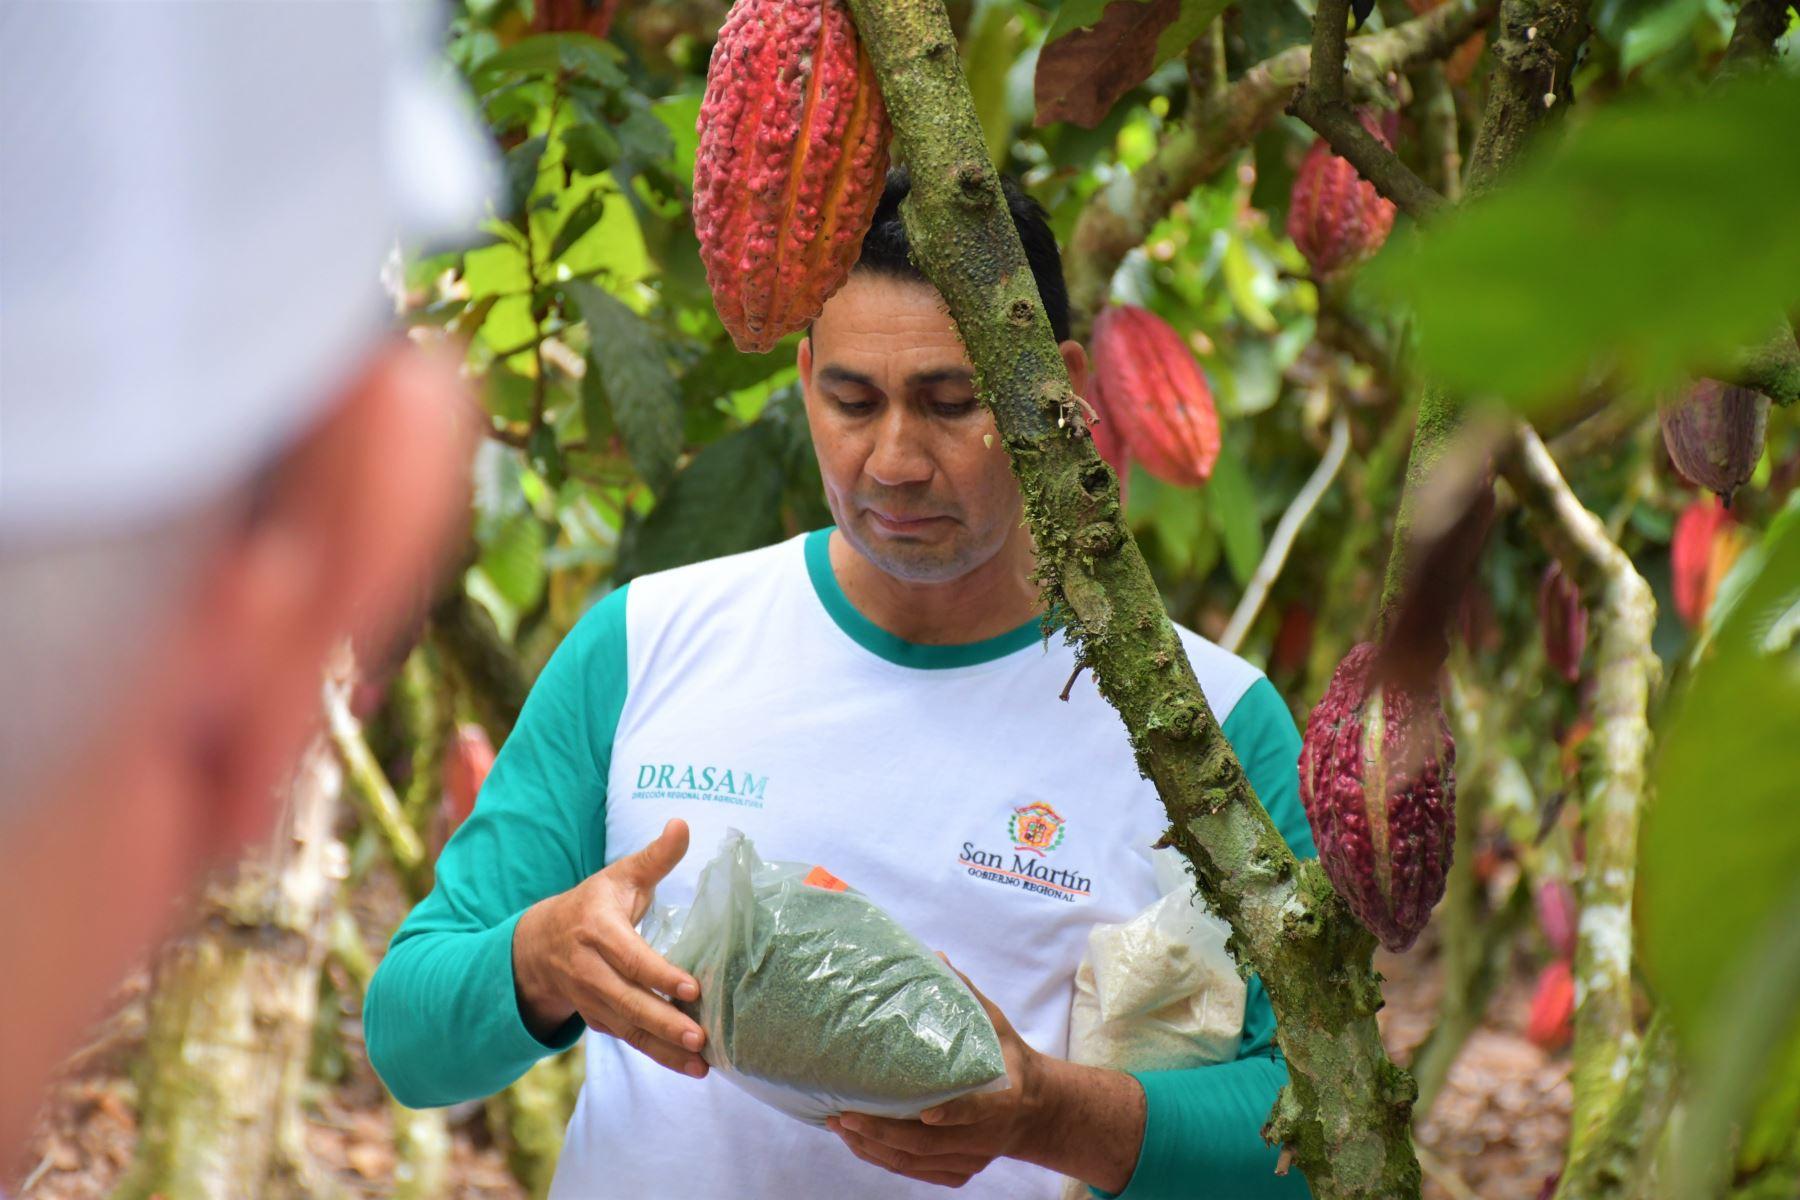 Investigación científica en San Martín logra reducir presencia de cadmio en plantas de cacao. ANDINA/Difusión